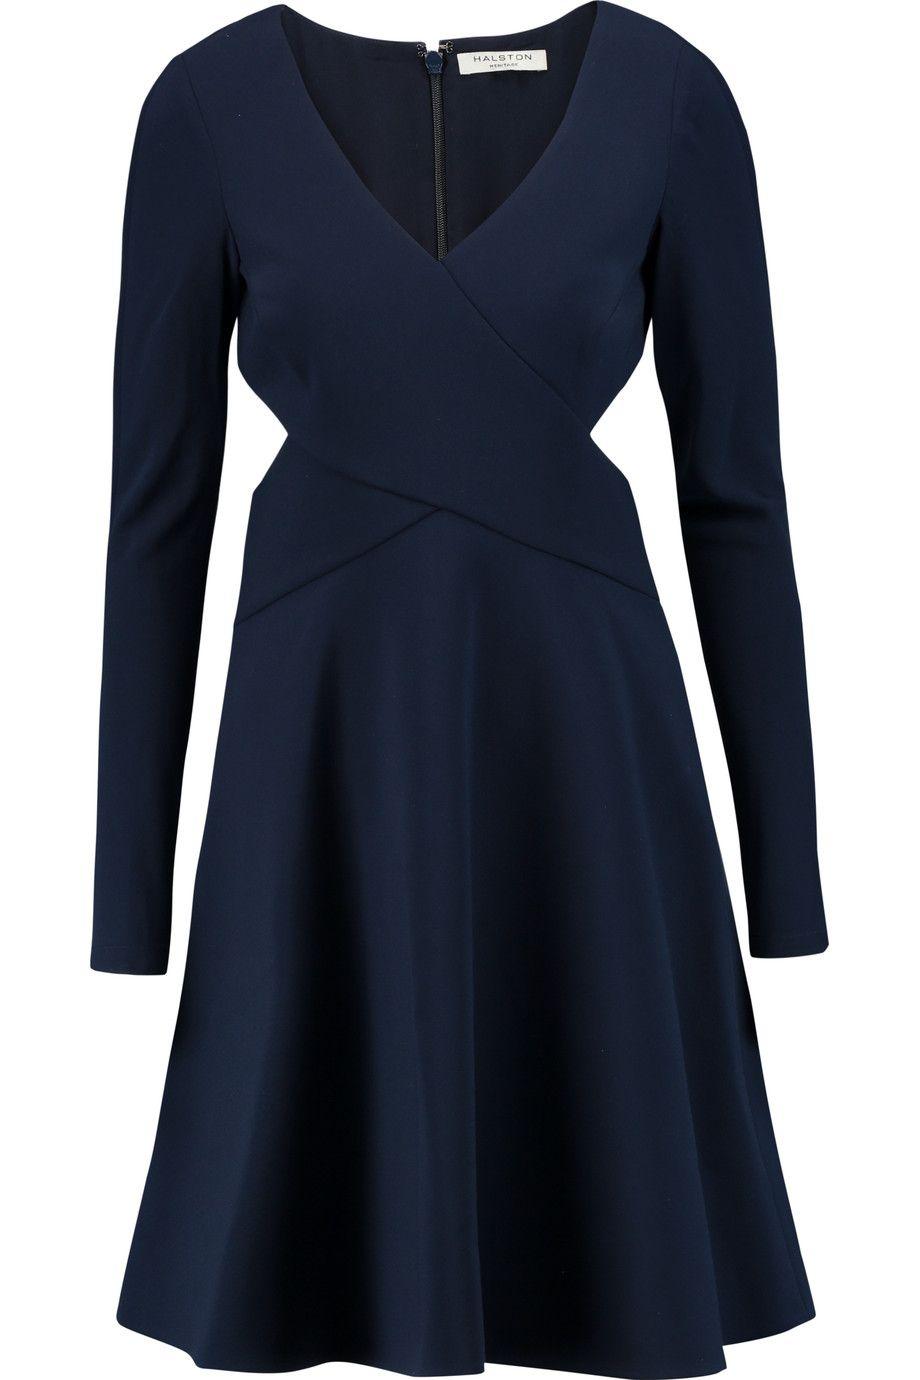 HALSTON HERITAGE Cutout Crepe Dress. #halstonheritage #cloth #dress